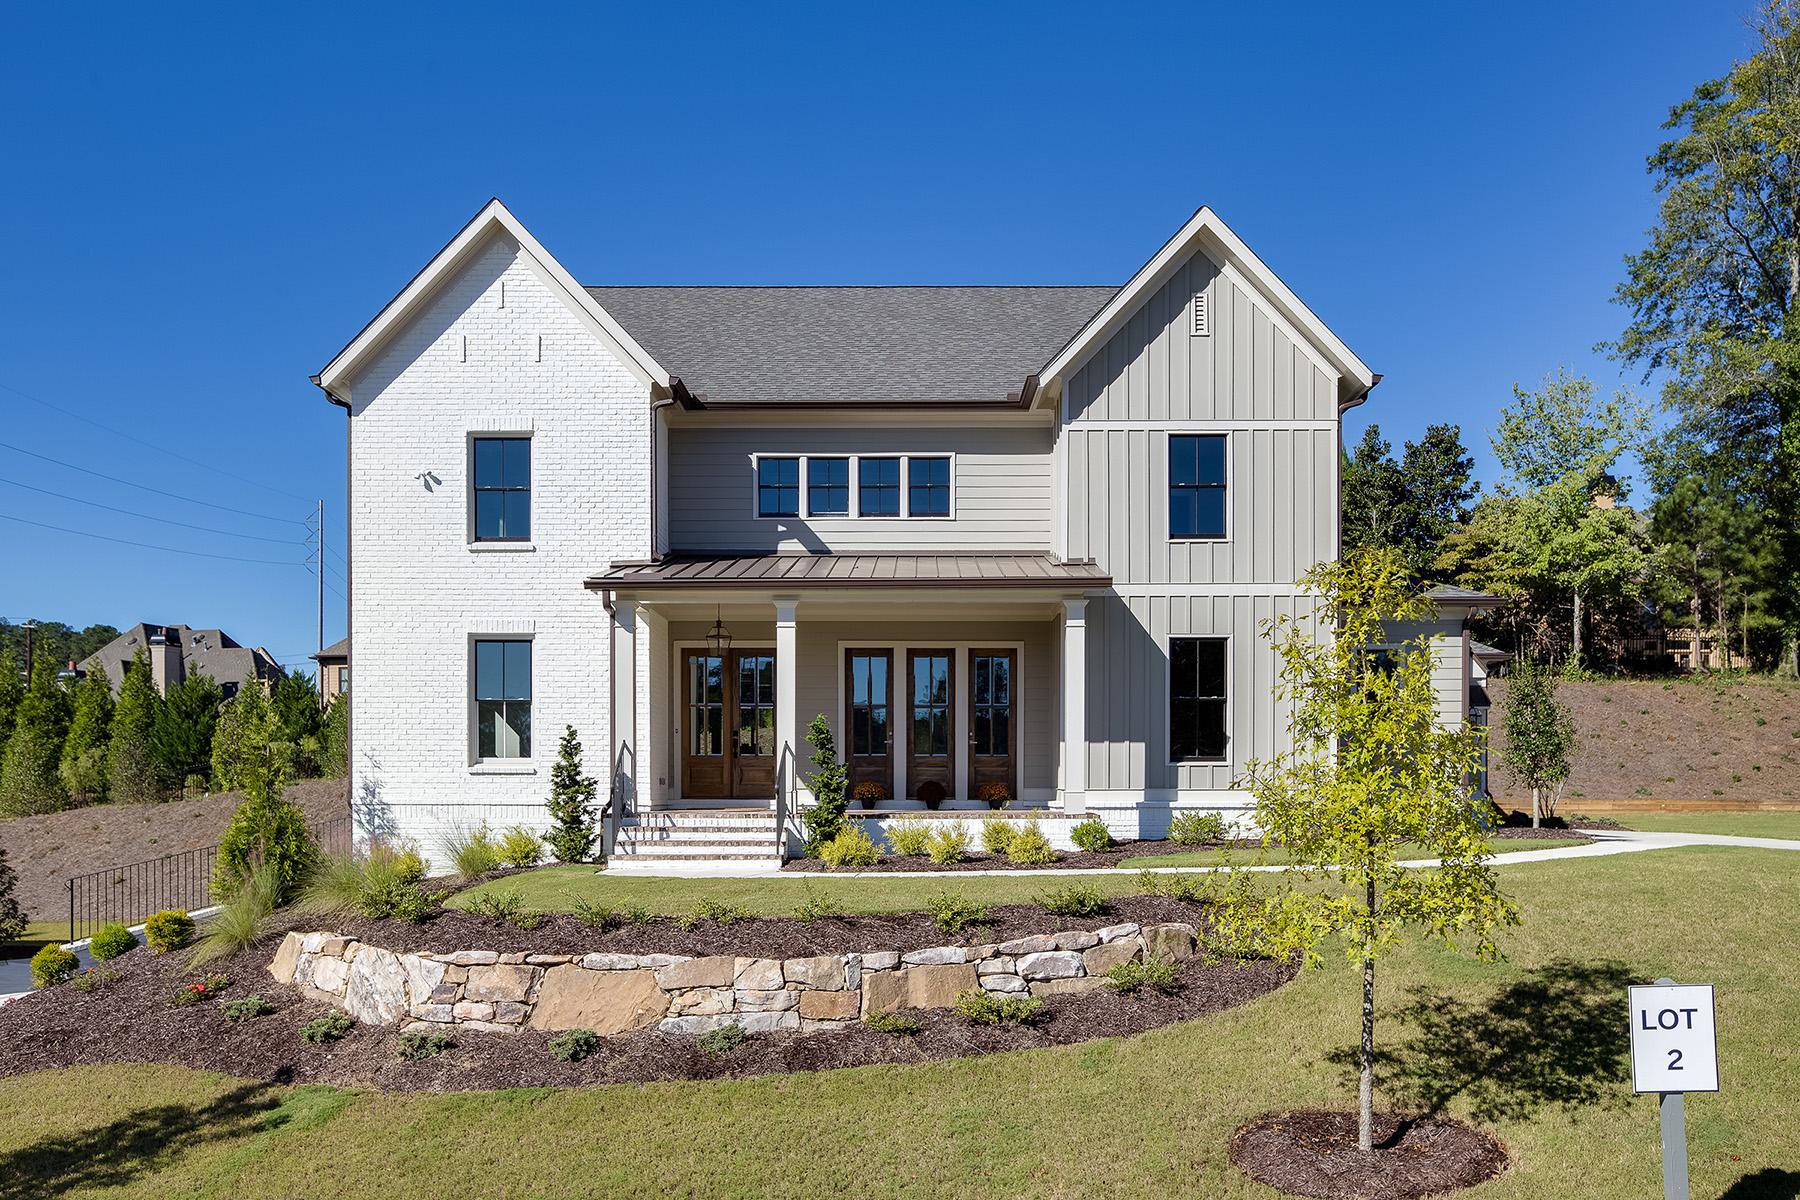 Single Family Home for Sale at Welcome to Birch Grove in Marietta 2187 Bliss Lane Marietta, Georgia 30062 United States